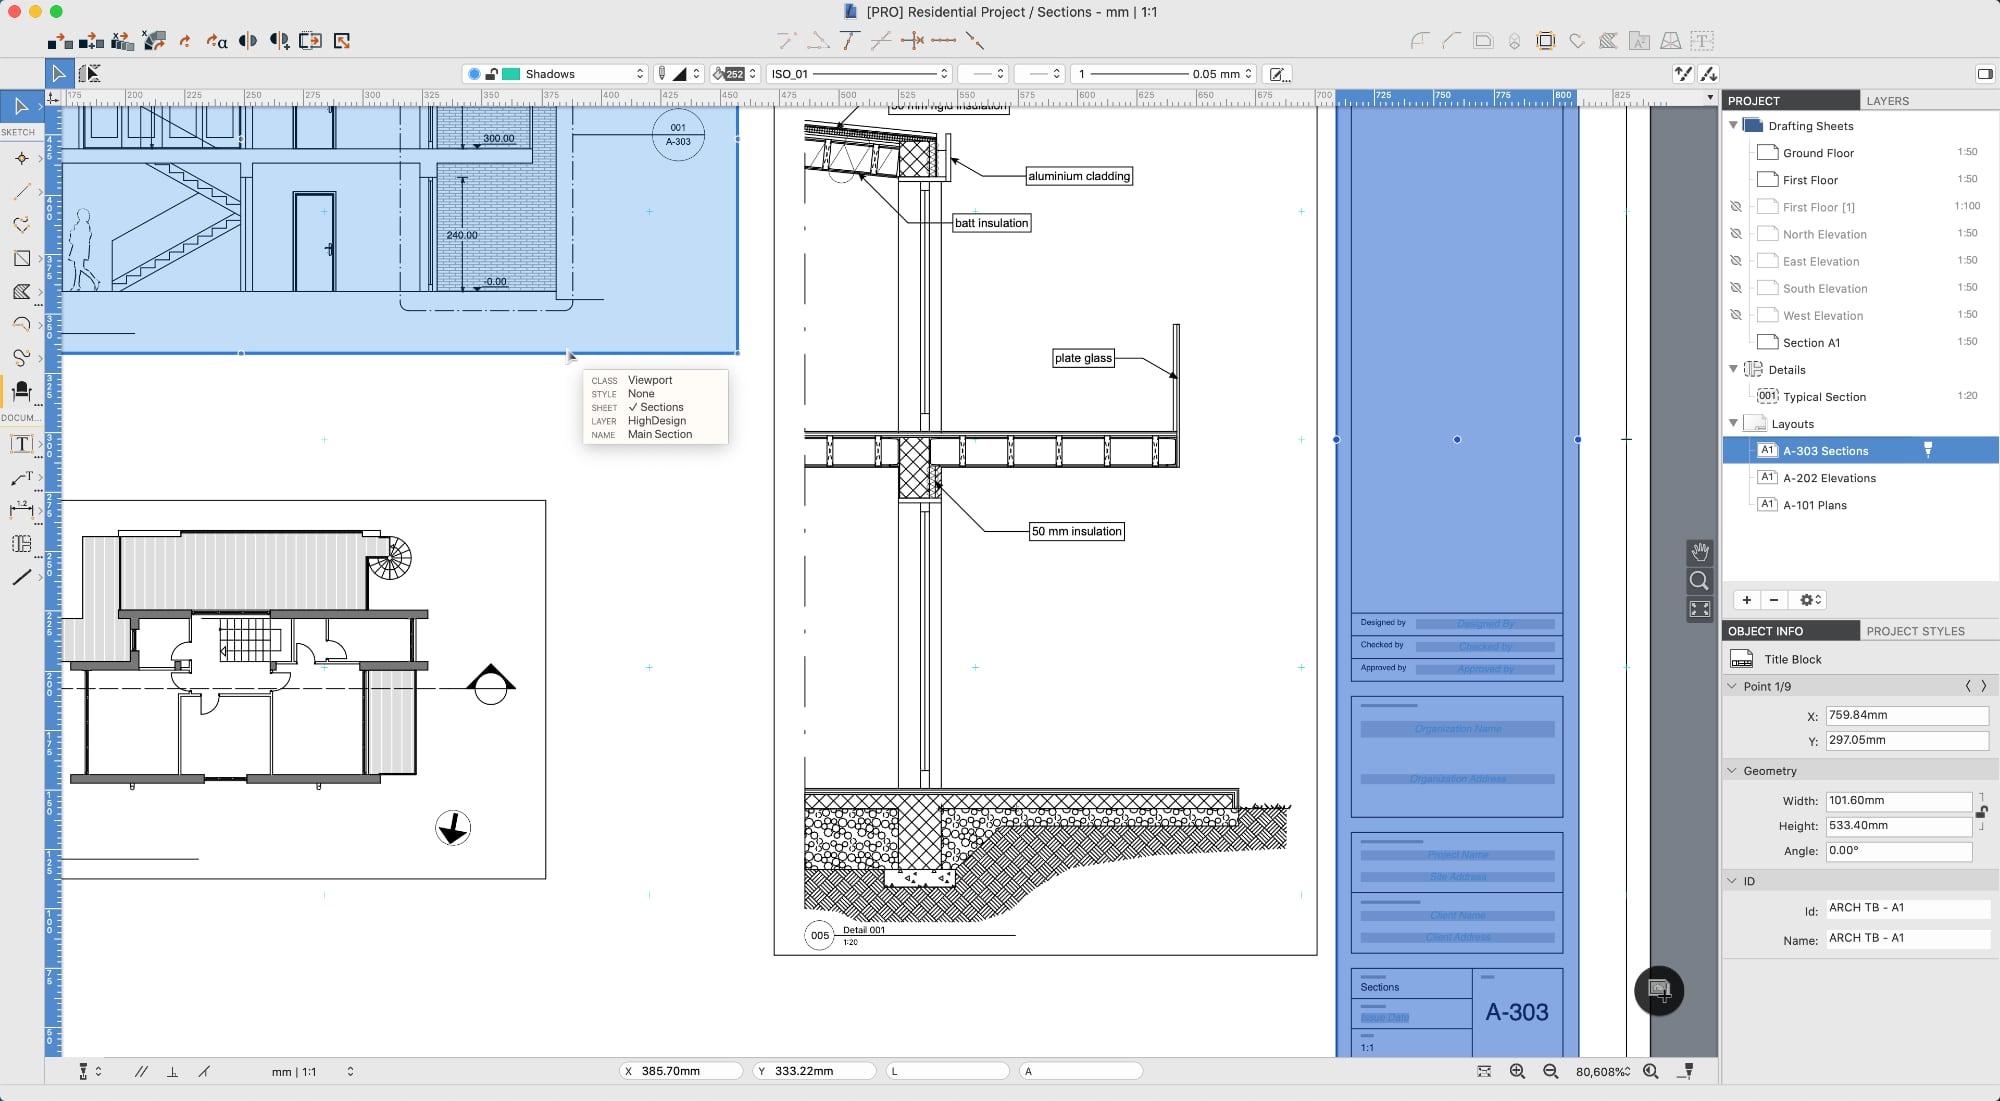 Ilexsoft Highdesign Cad Architecture Engineering Design Software For Mac And Windows